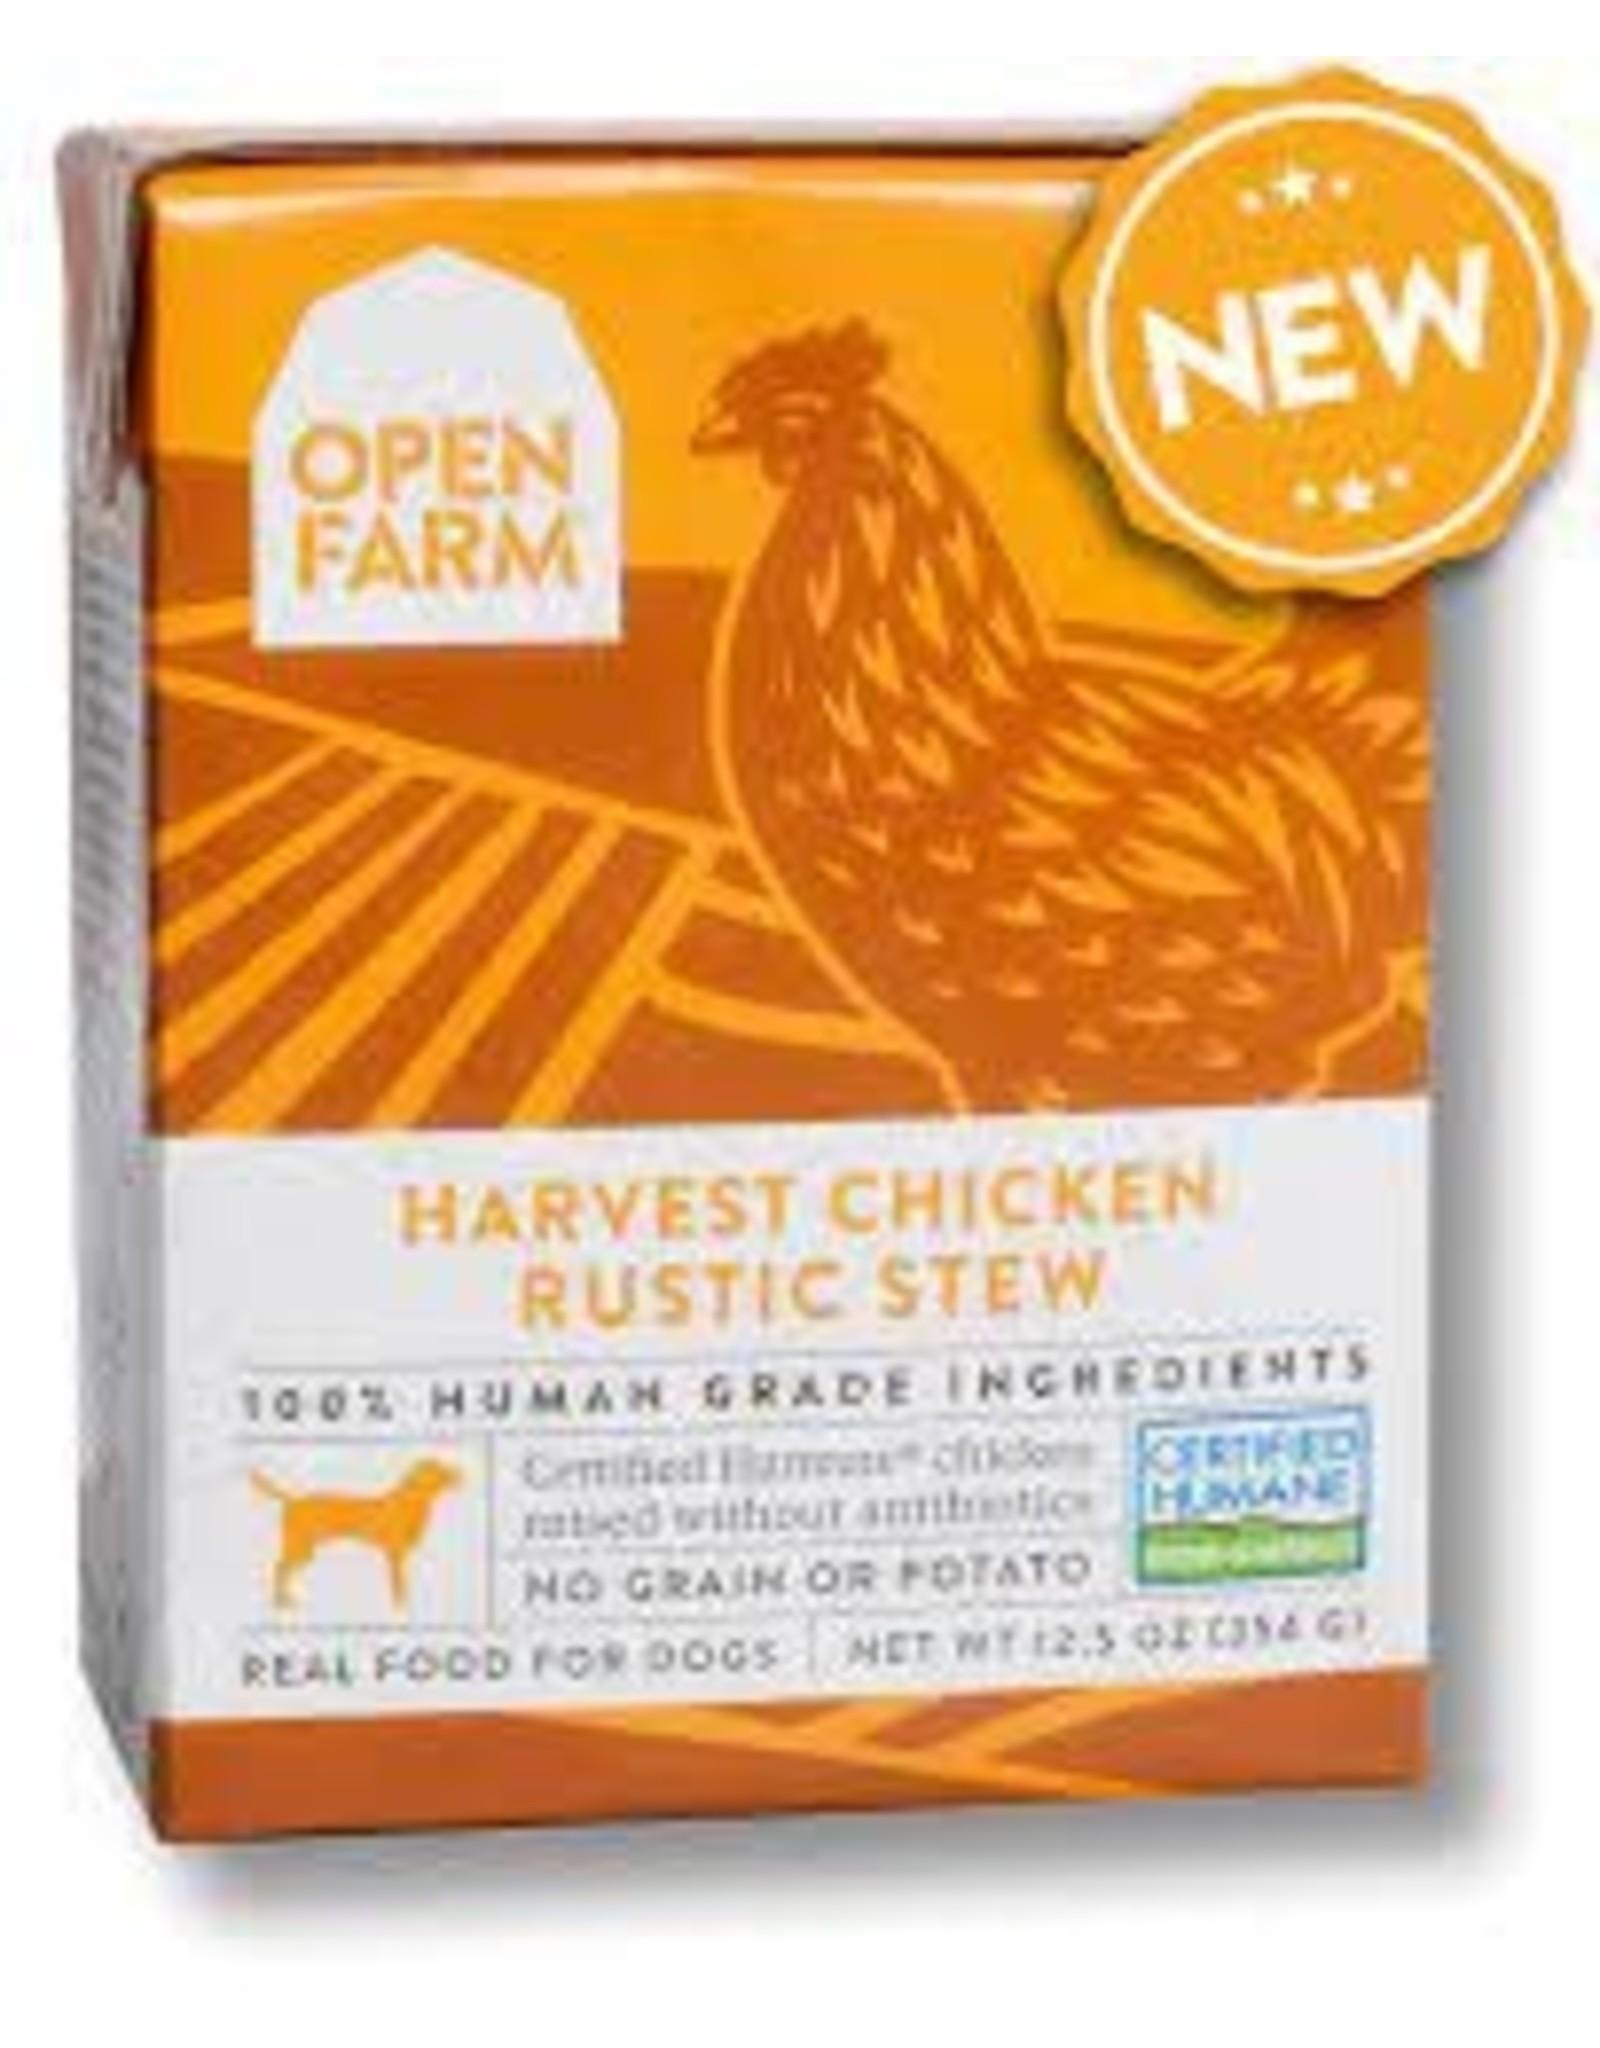 Open Farm Chicken Rustic Stew, 12.5oz